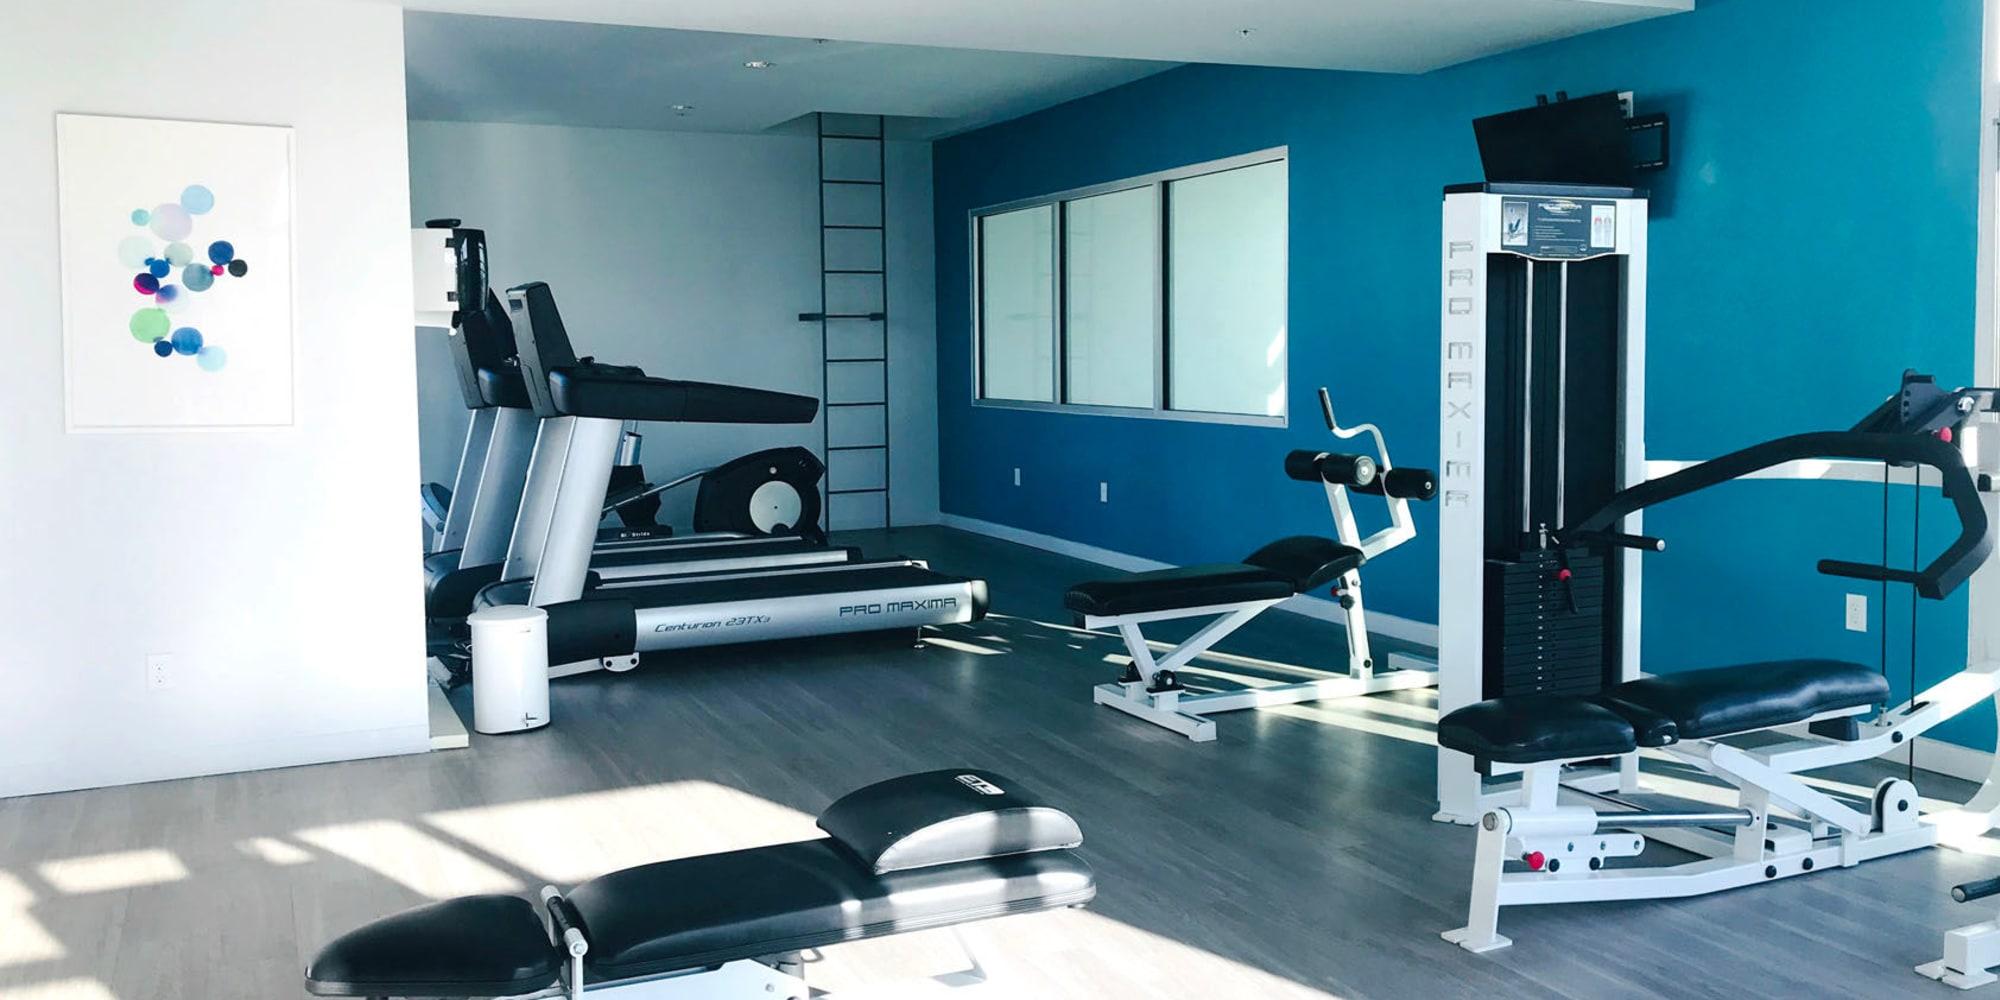 Cardio equipment and exercise machines in the fitness center at Citron in Ventura, California